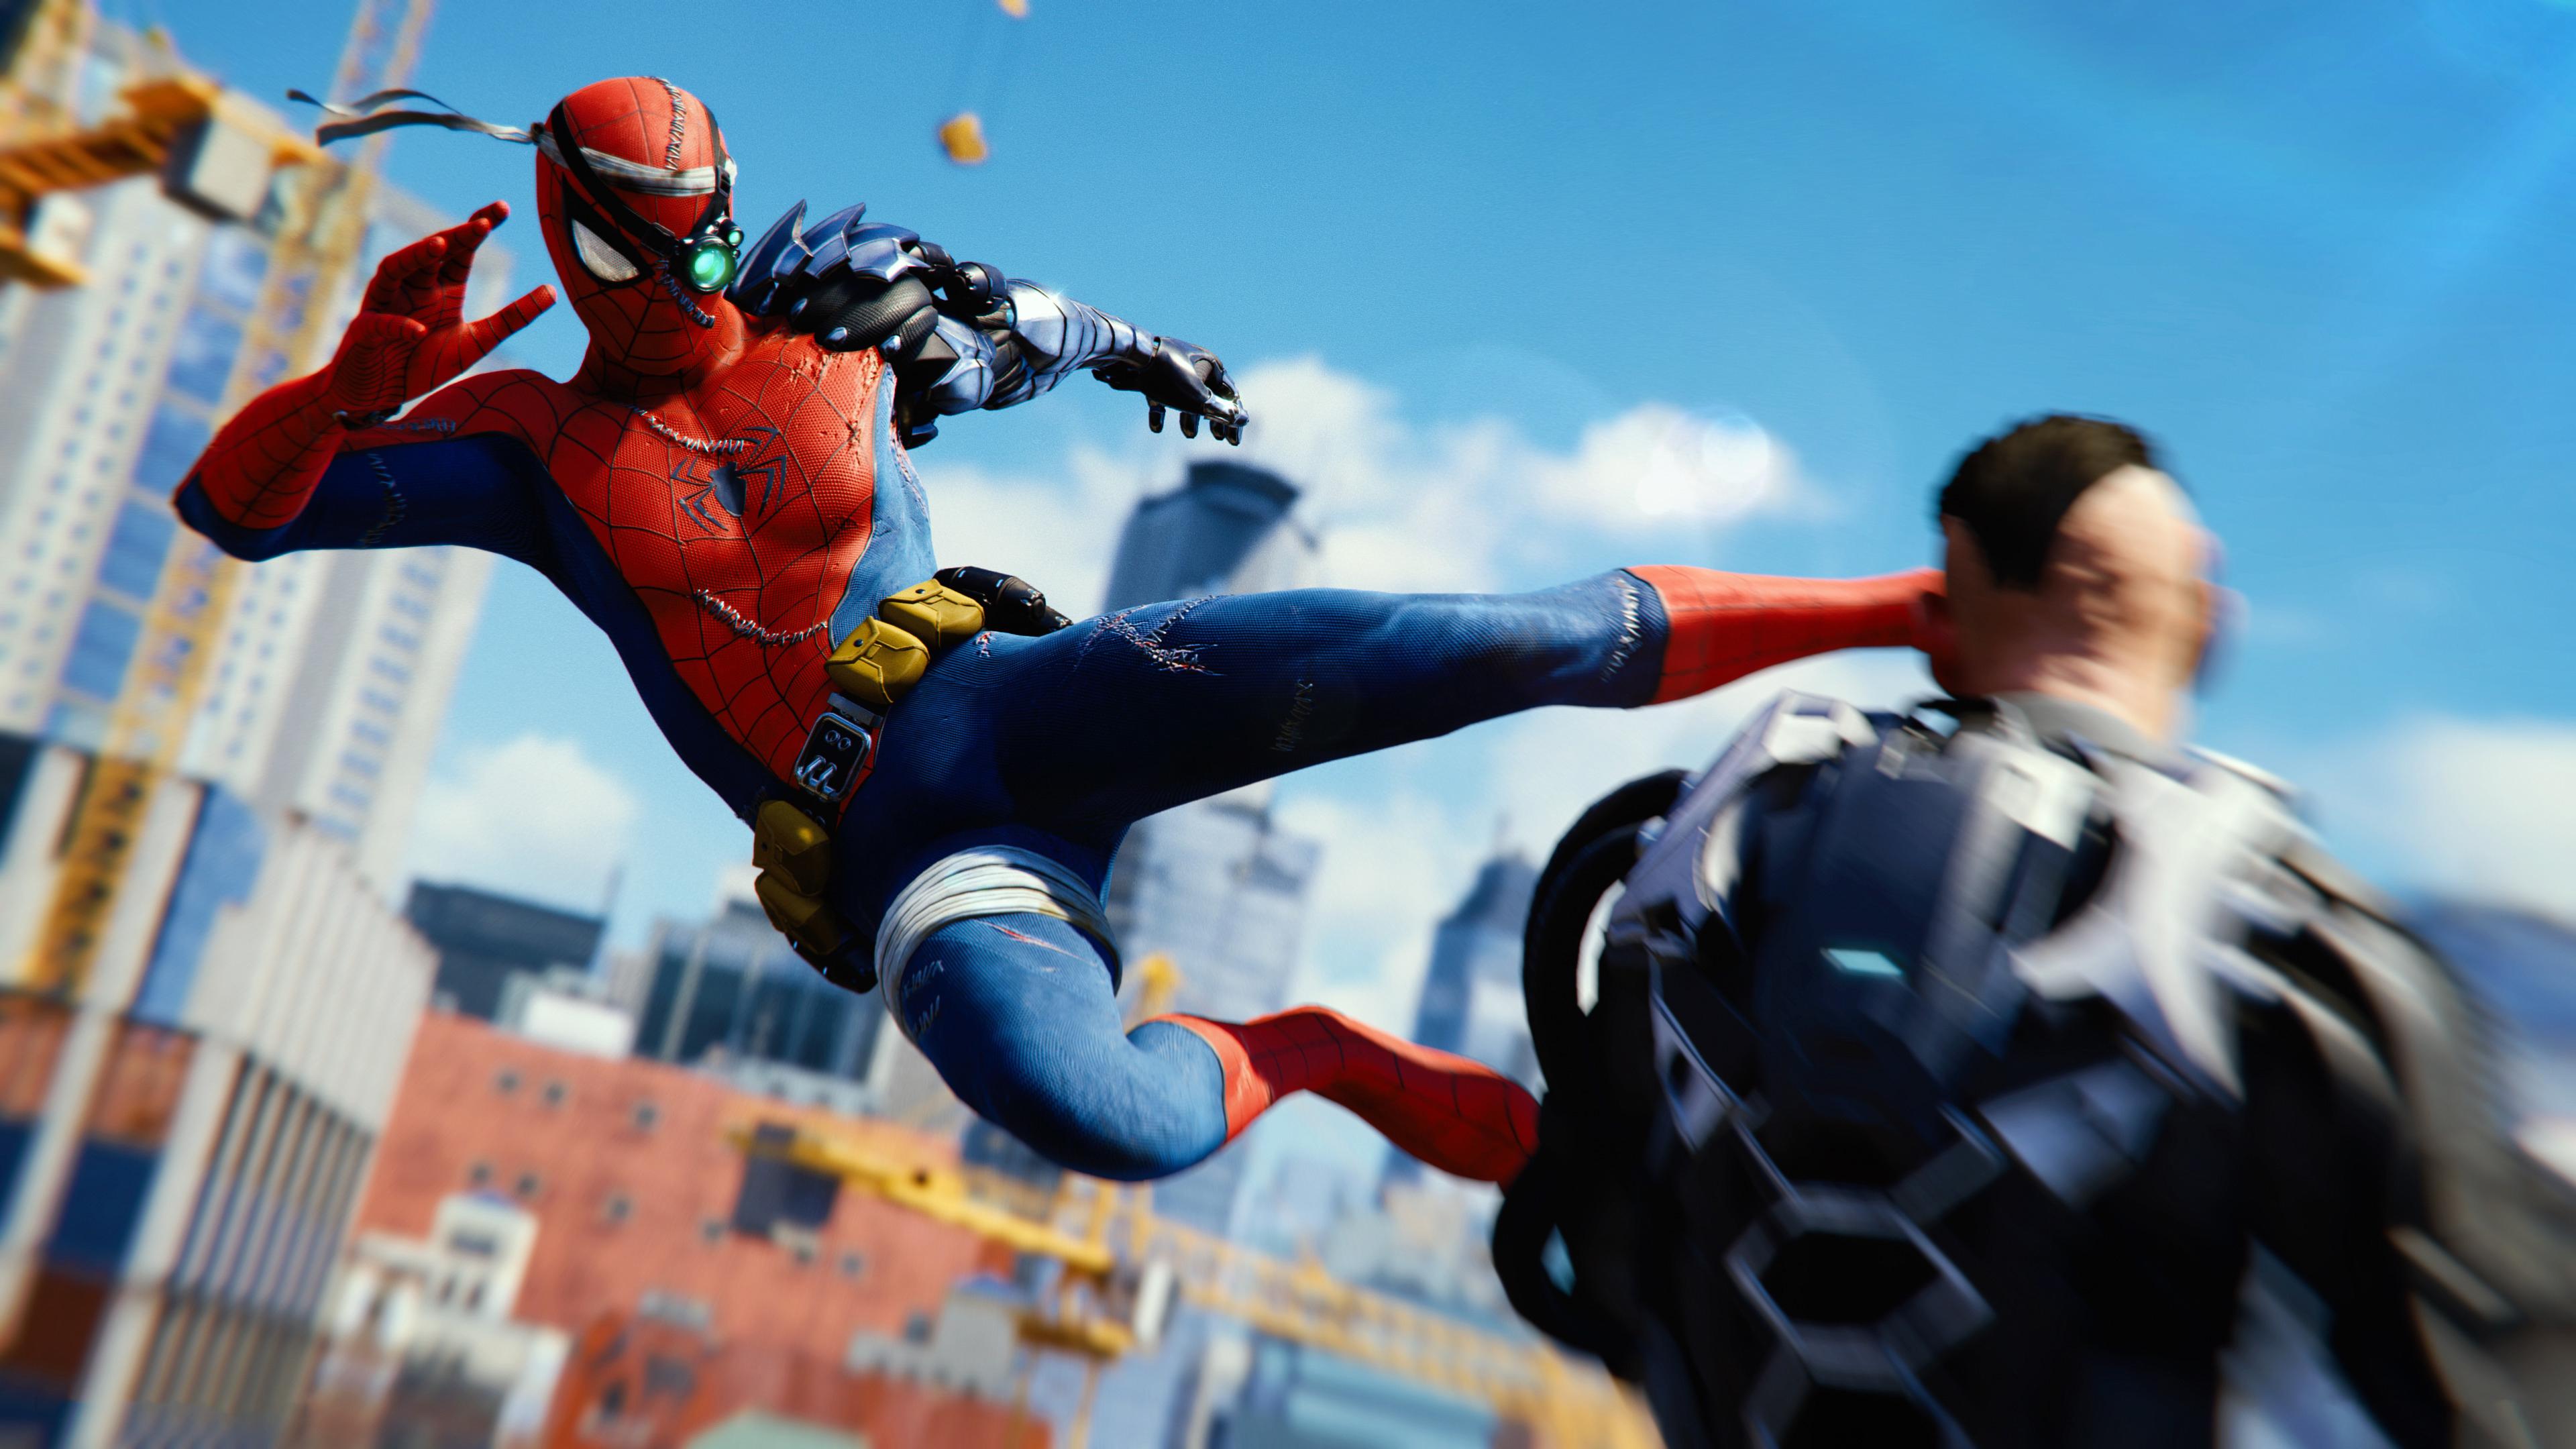 spiderman ps4 attack 4k 1545589251 - Spiderman Ps4 Attack 4k - superheroes wallpapers, spiderman wallpapers, spiderman ps4 wallpapers, ps games wallpapers, hd-wallpapers, games wallpapers, 4k-wallpapers, 2018 games wallpapers